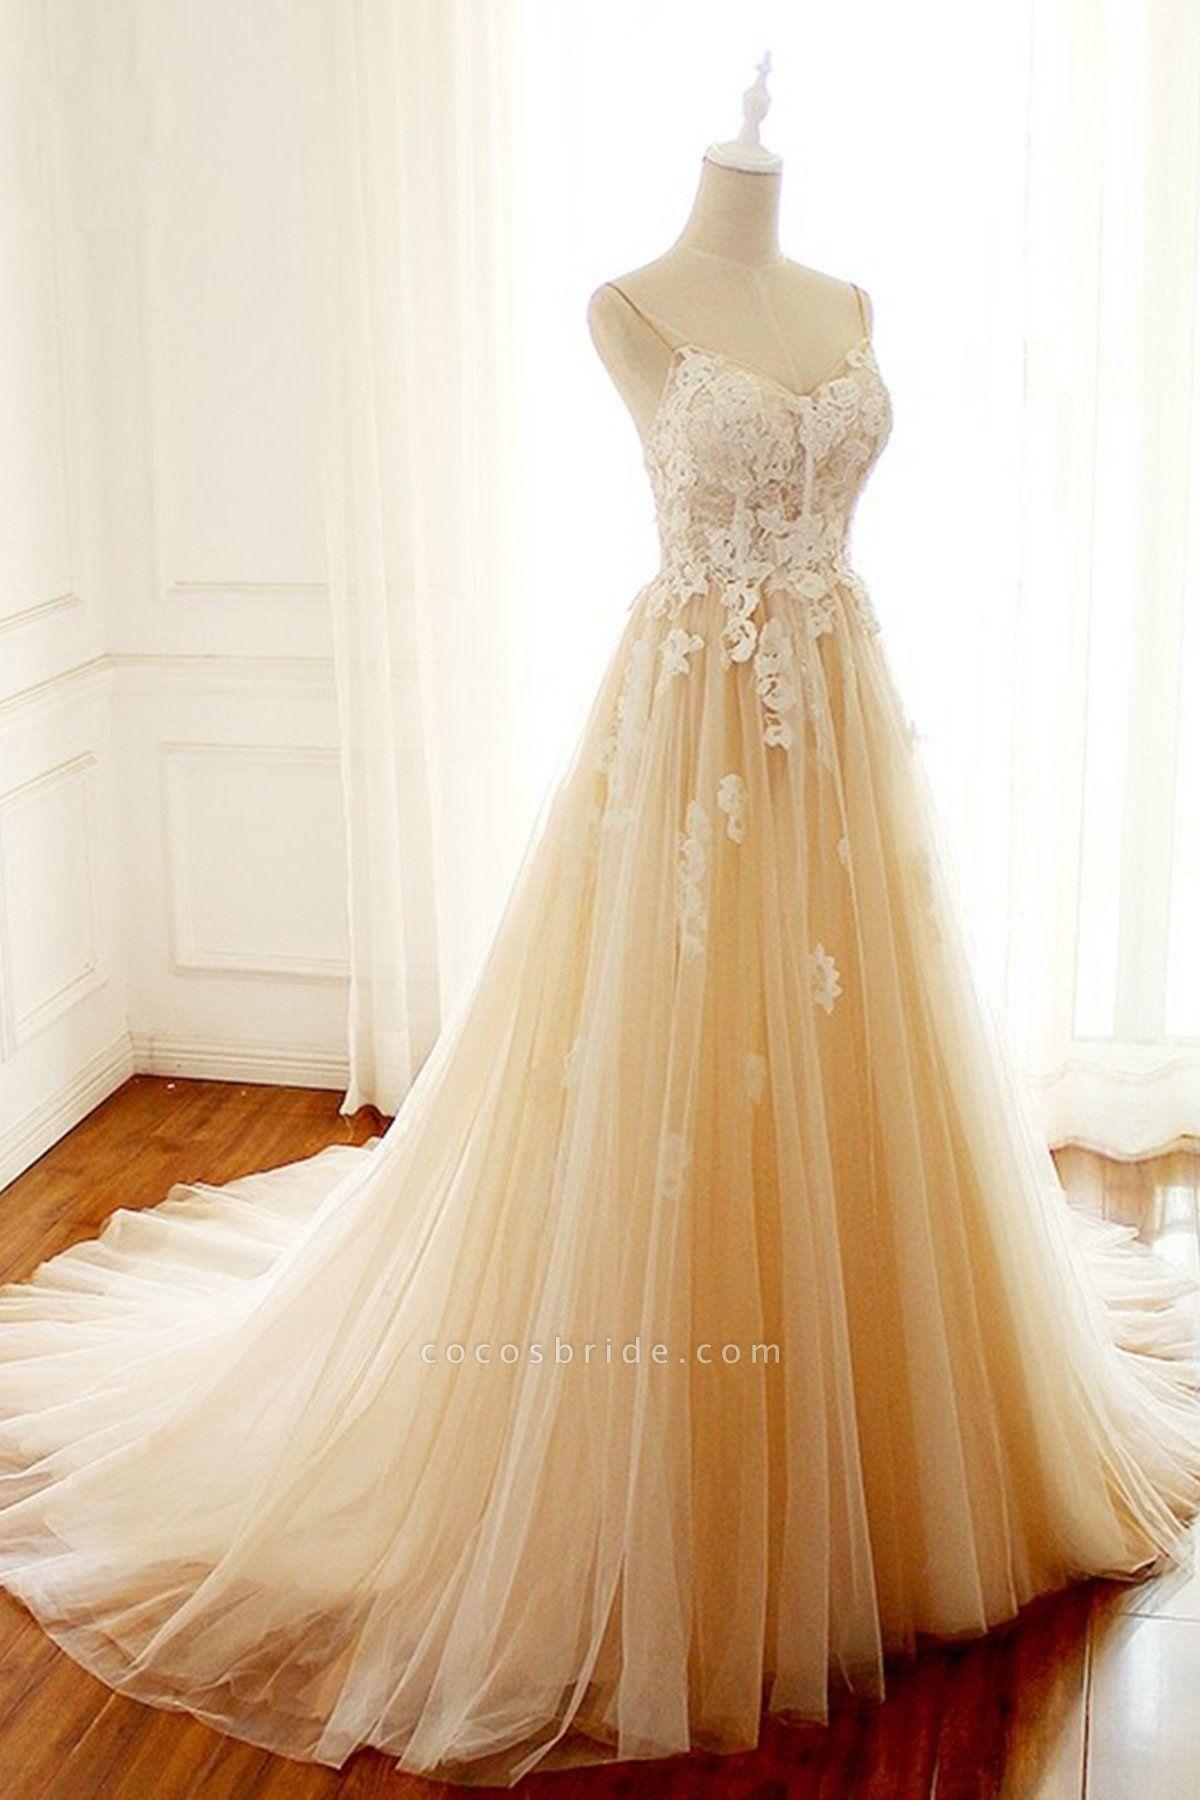 Sweetheart Creamy Tulle Spaghetti Sweep Train Wedding Dress